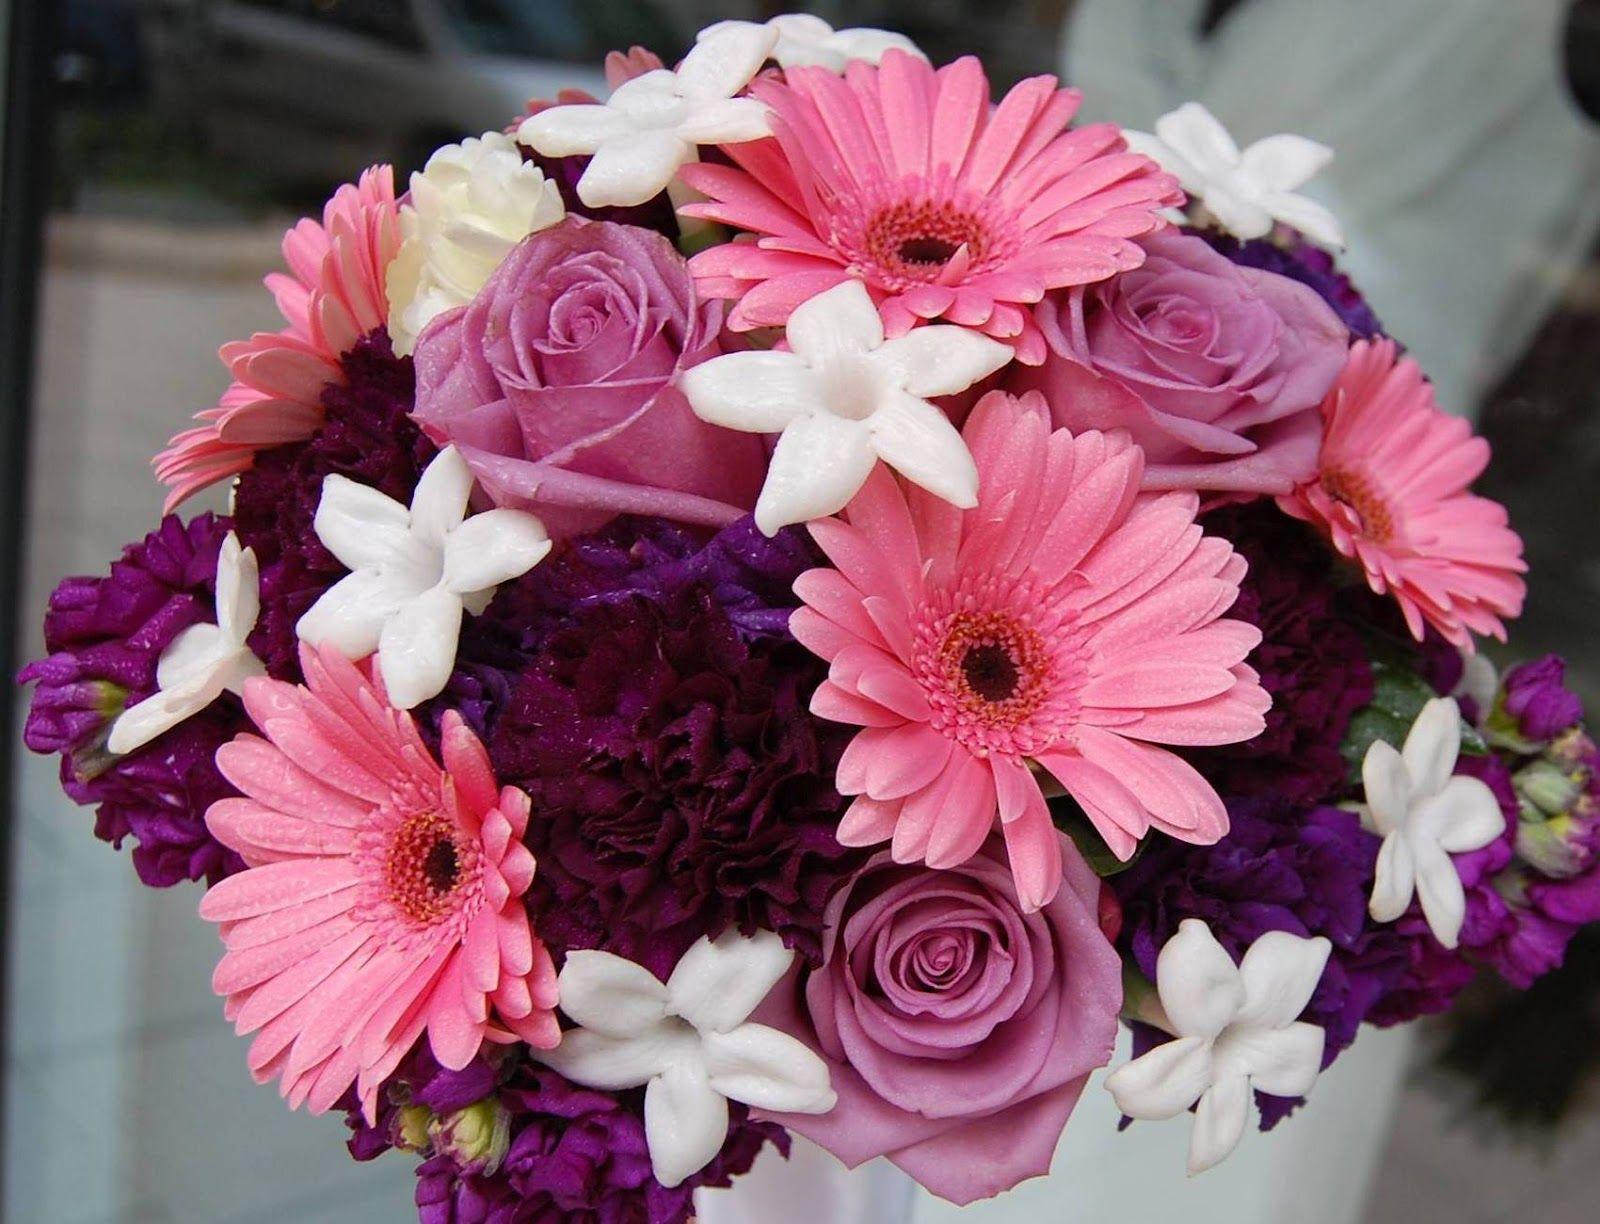 Pretty Flower Arrangements daisy flowers: daisy flower arrangement | floral | pinterest